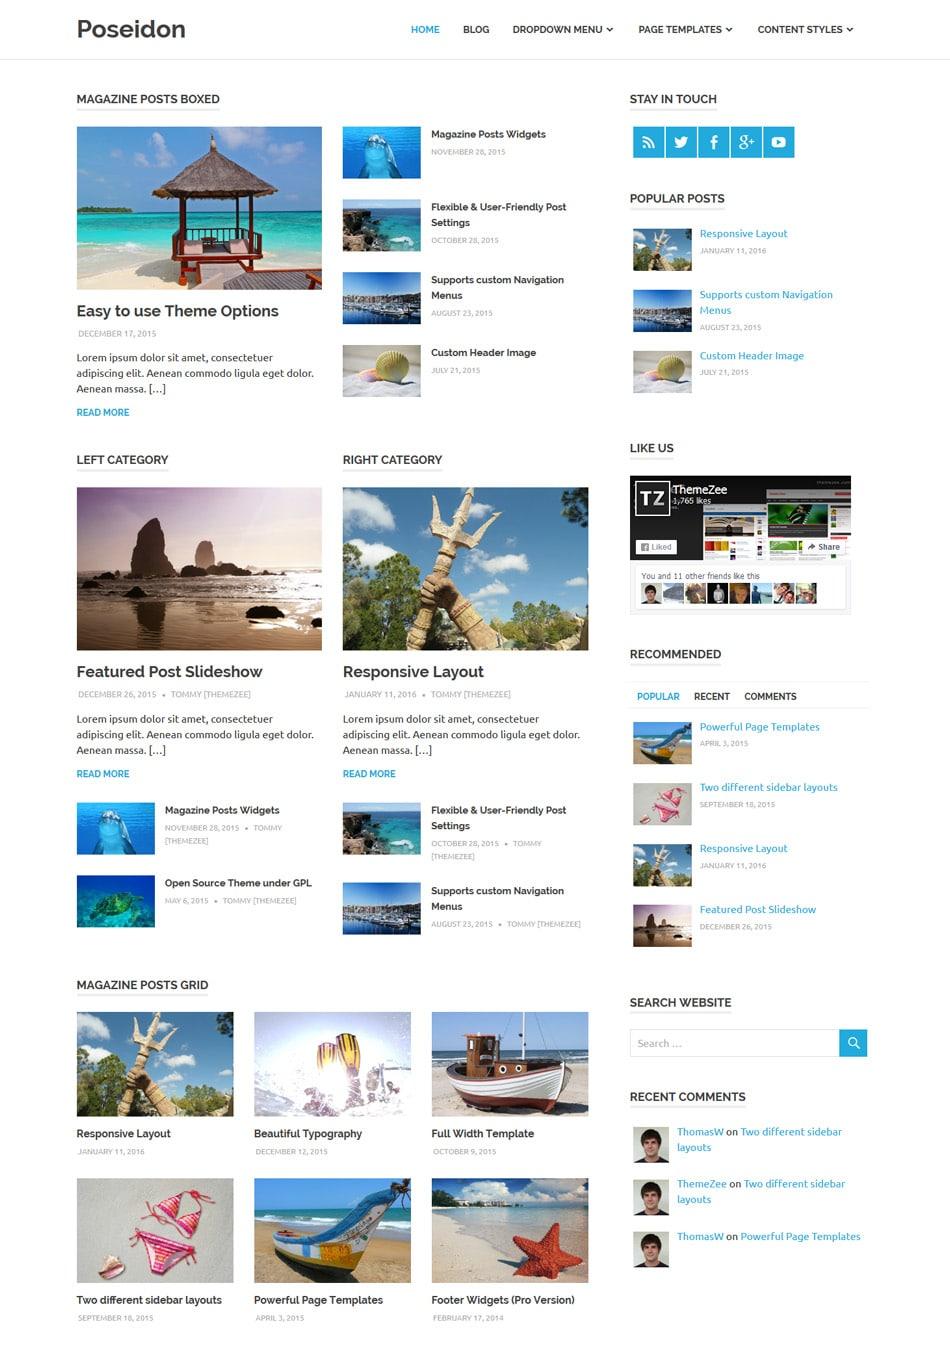 poseidon-magazine-homepage